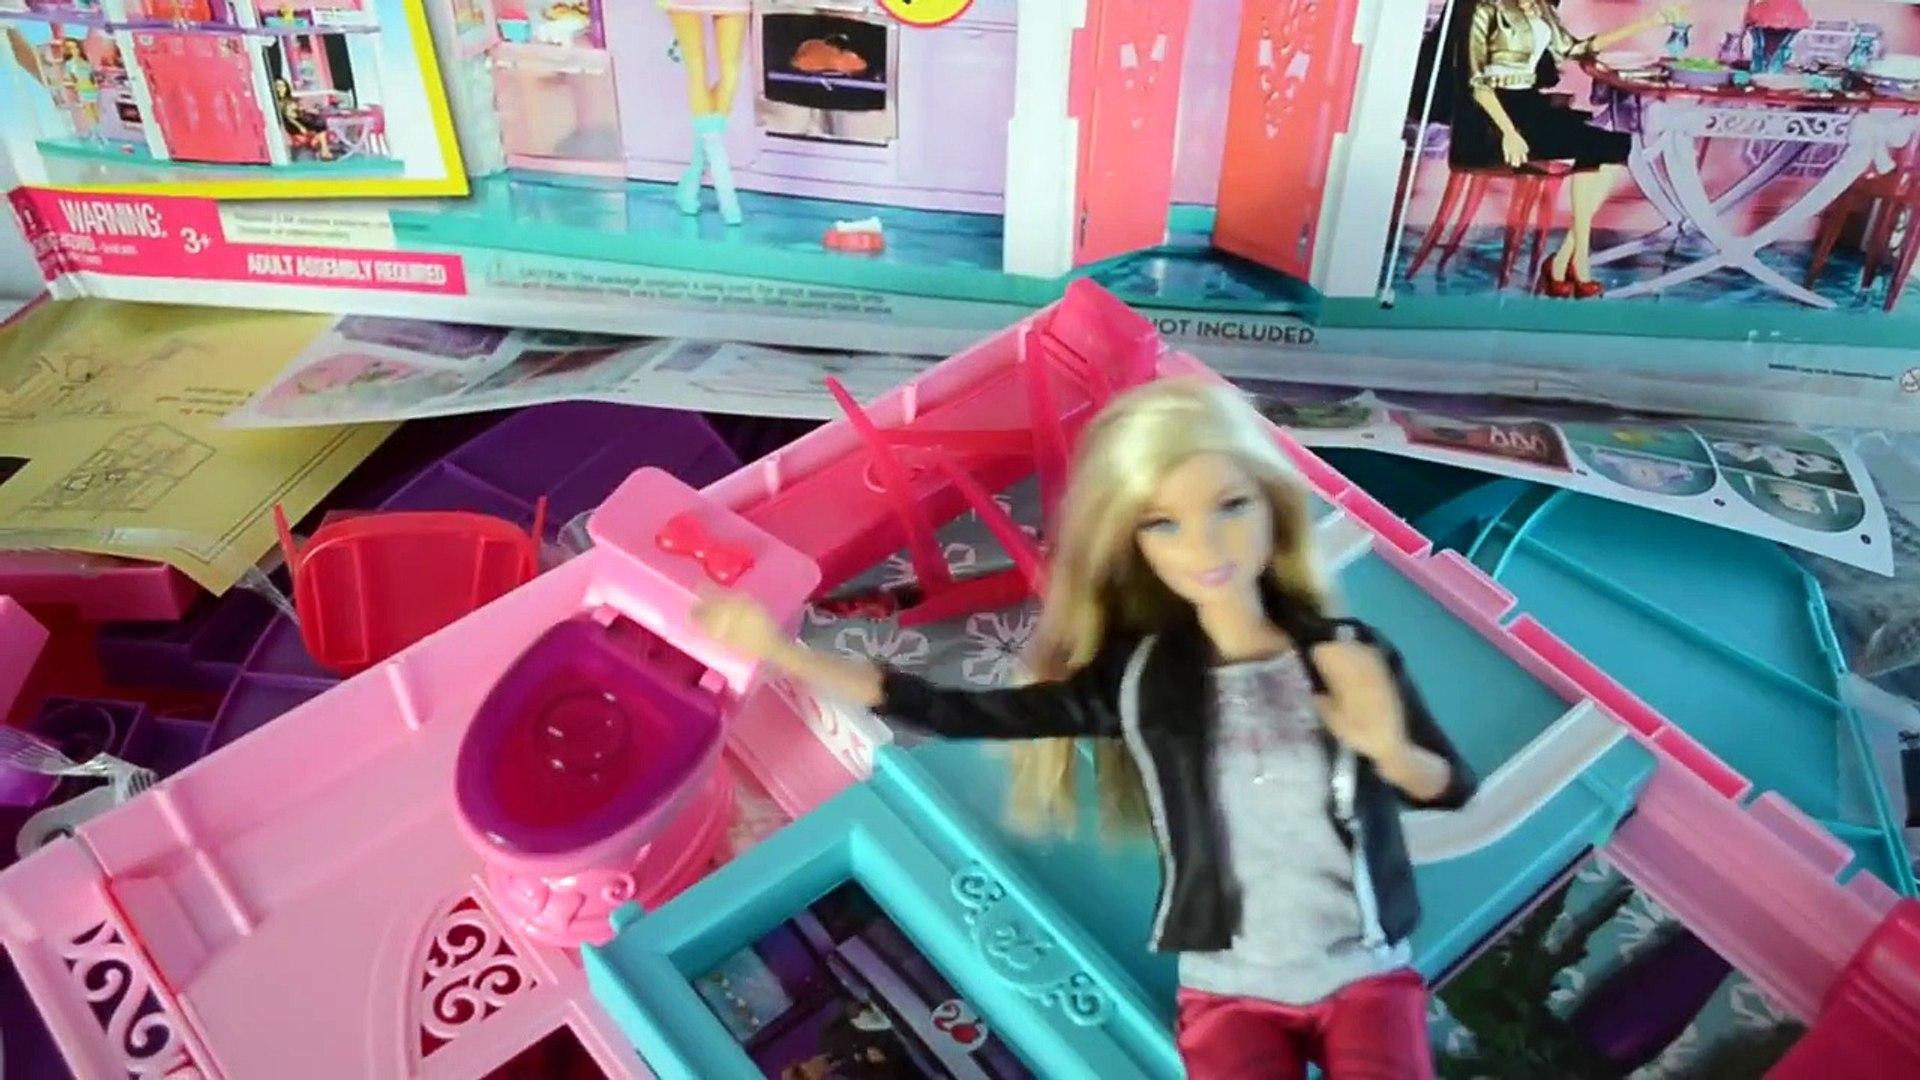 Casa da Barbie 3 andares Elevador casinha de boneca Barbe Kristoff Frozen DreamHouse